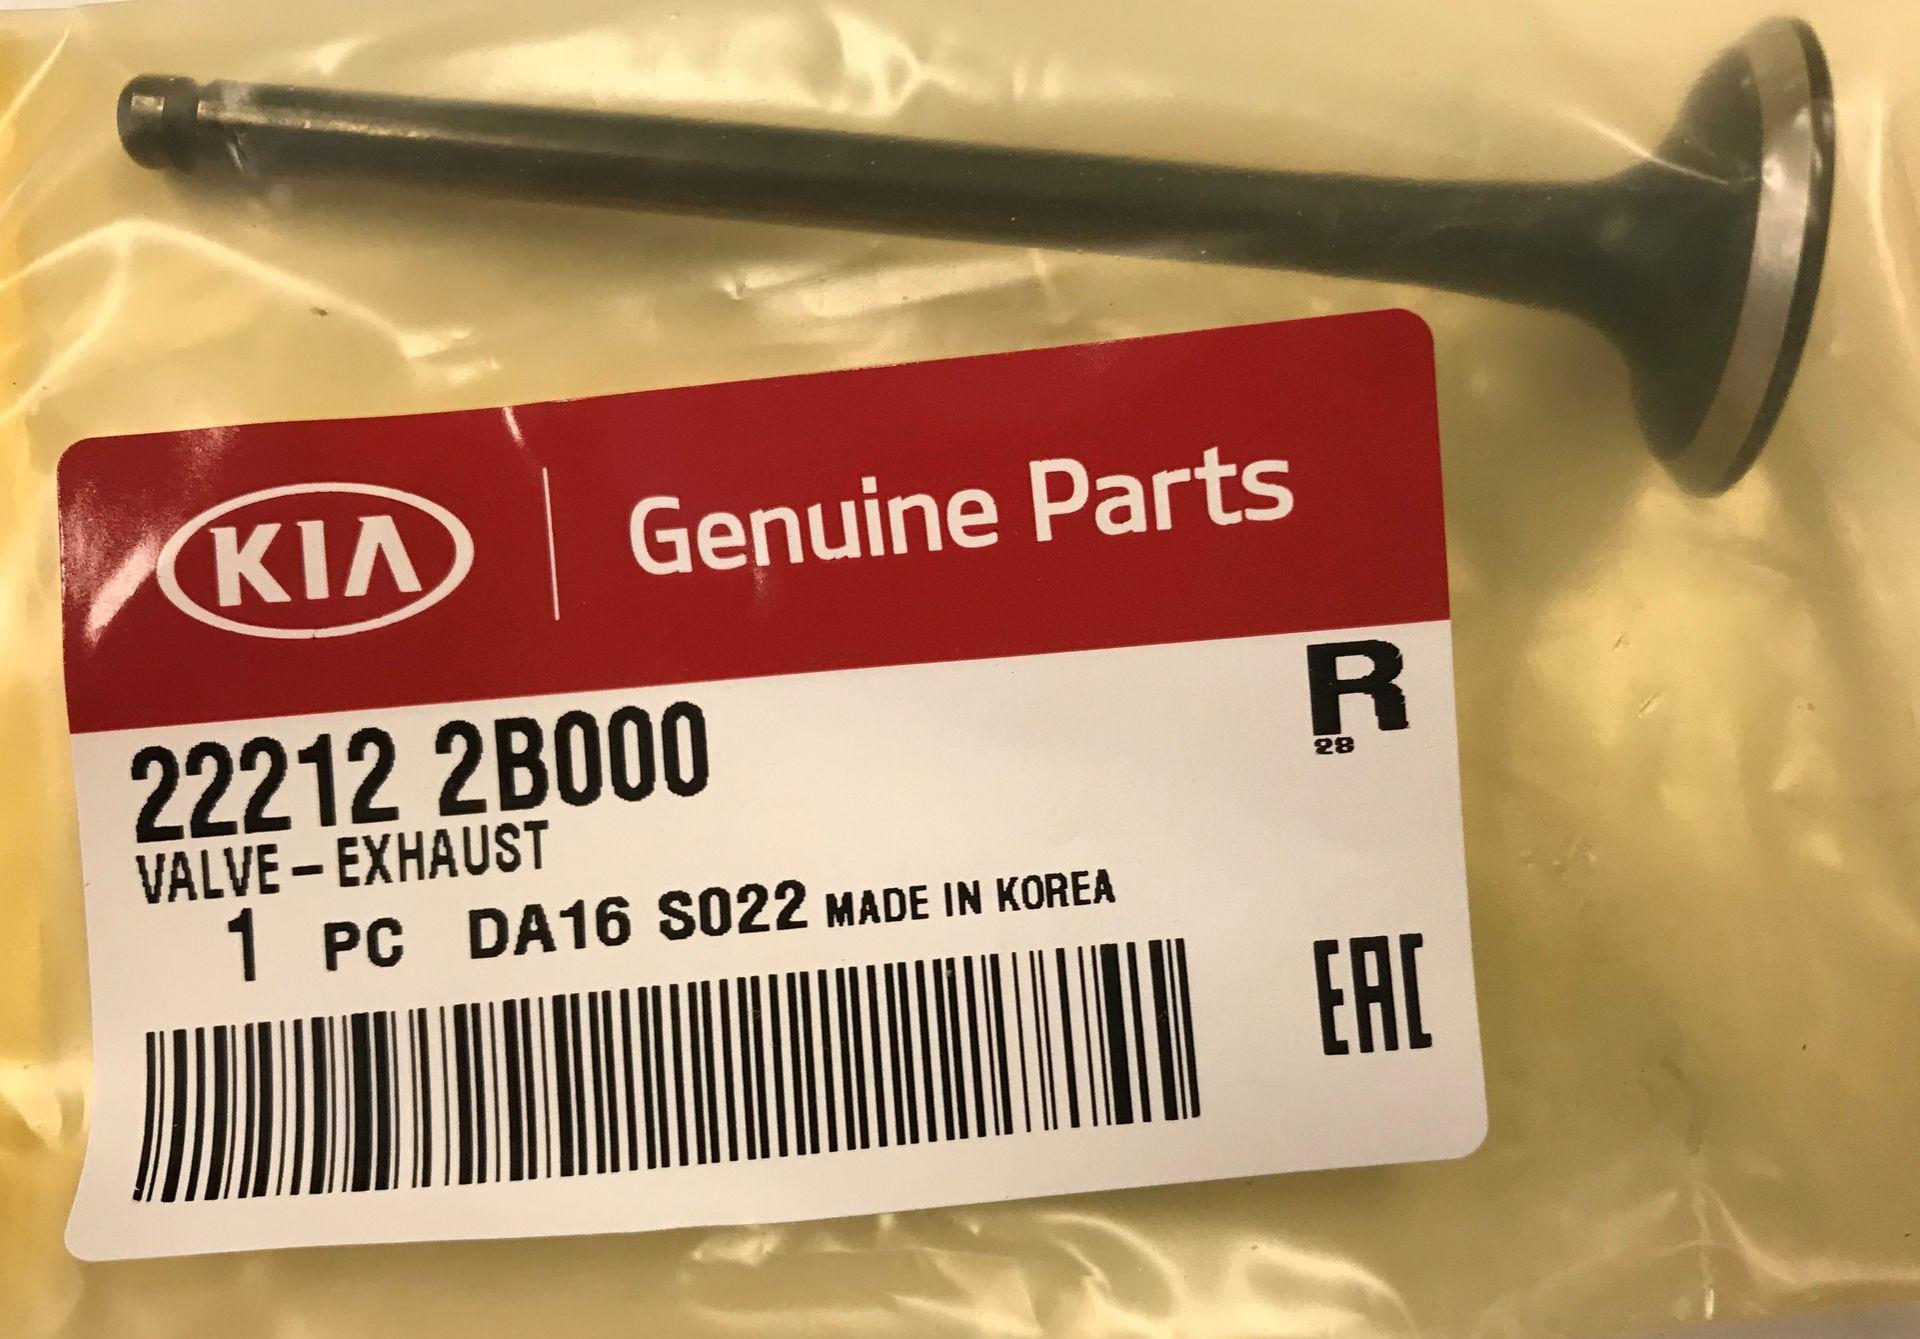 Exhaust Valve - Kia (22212-2B000)